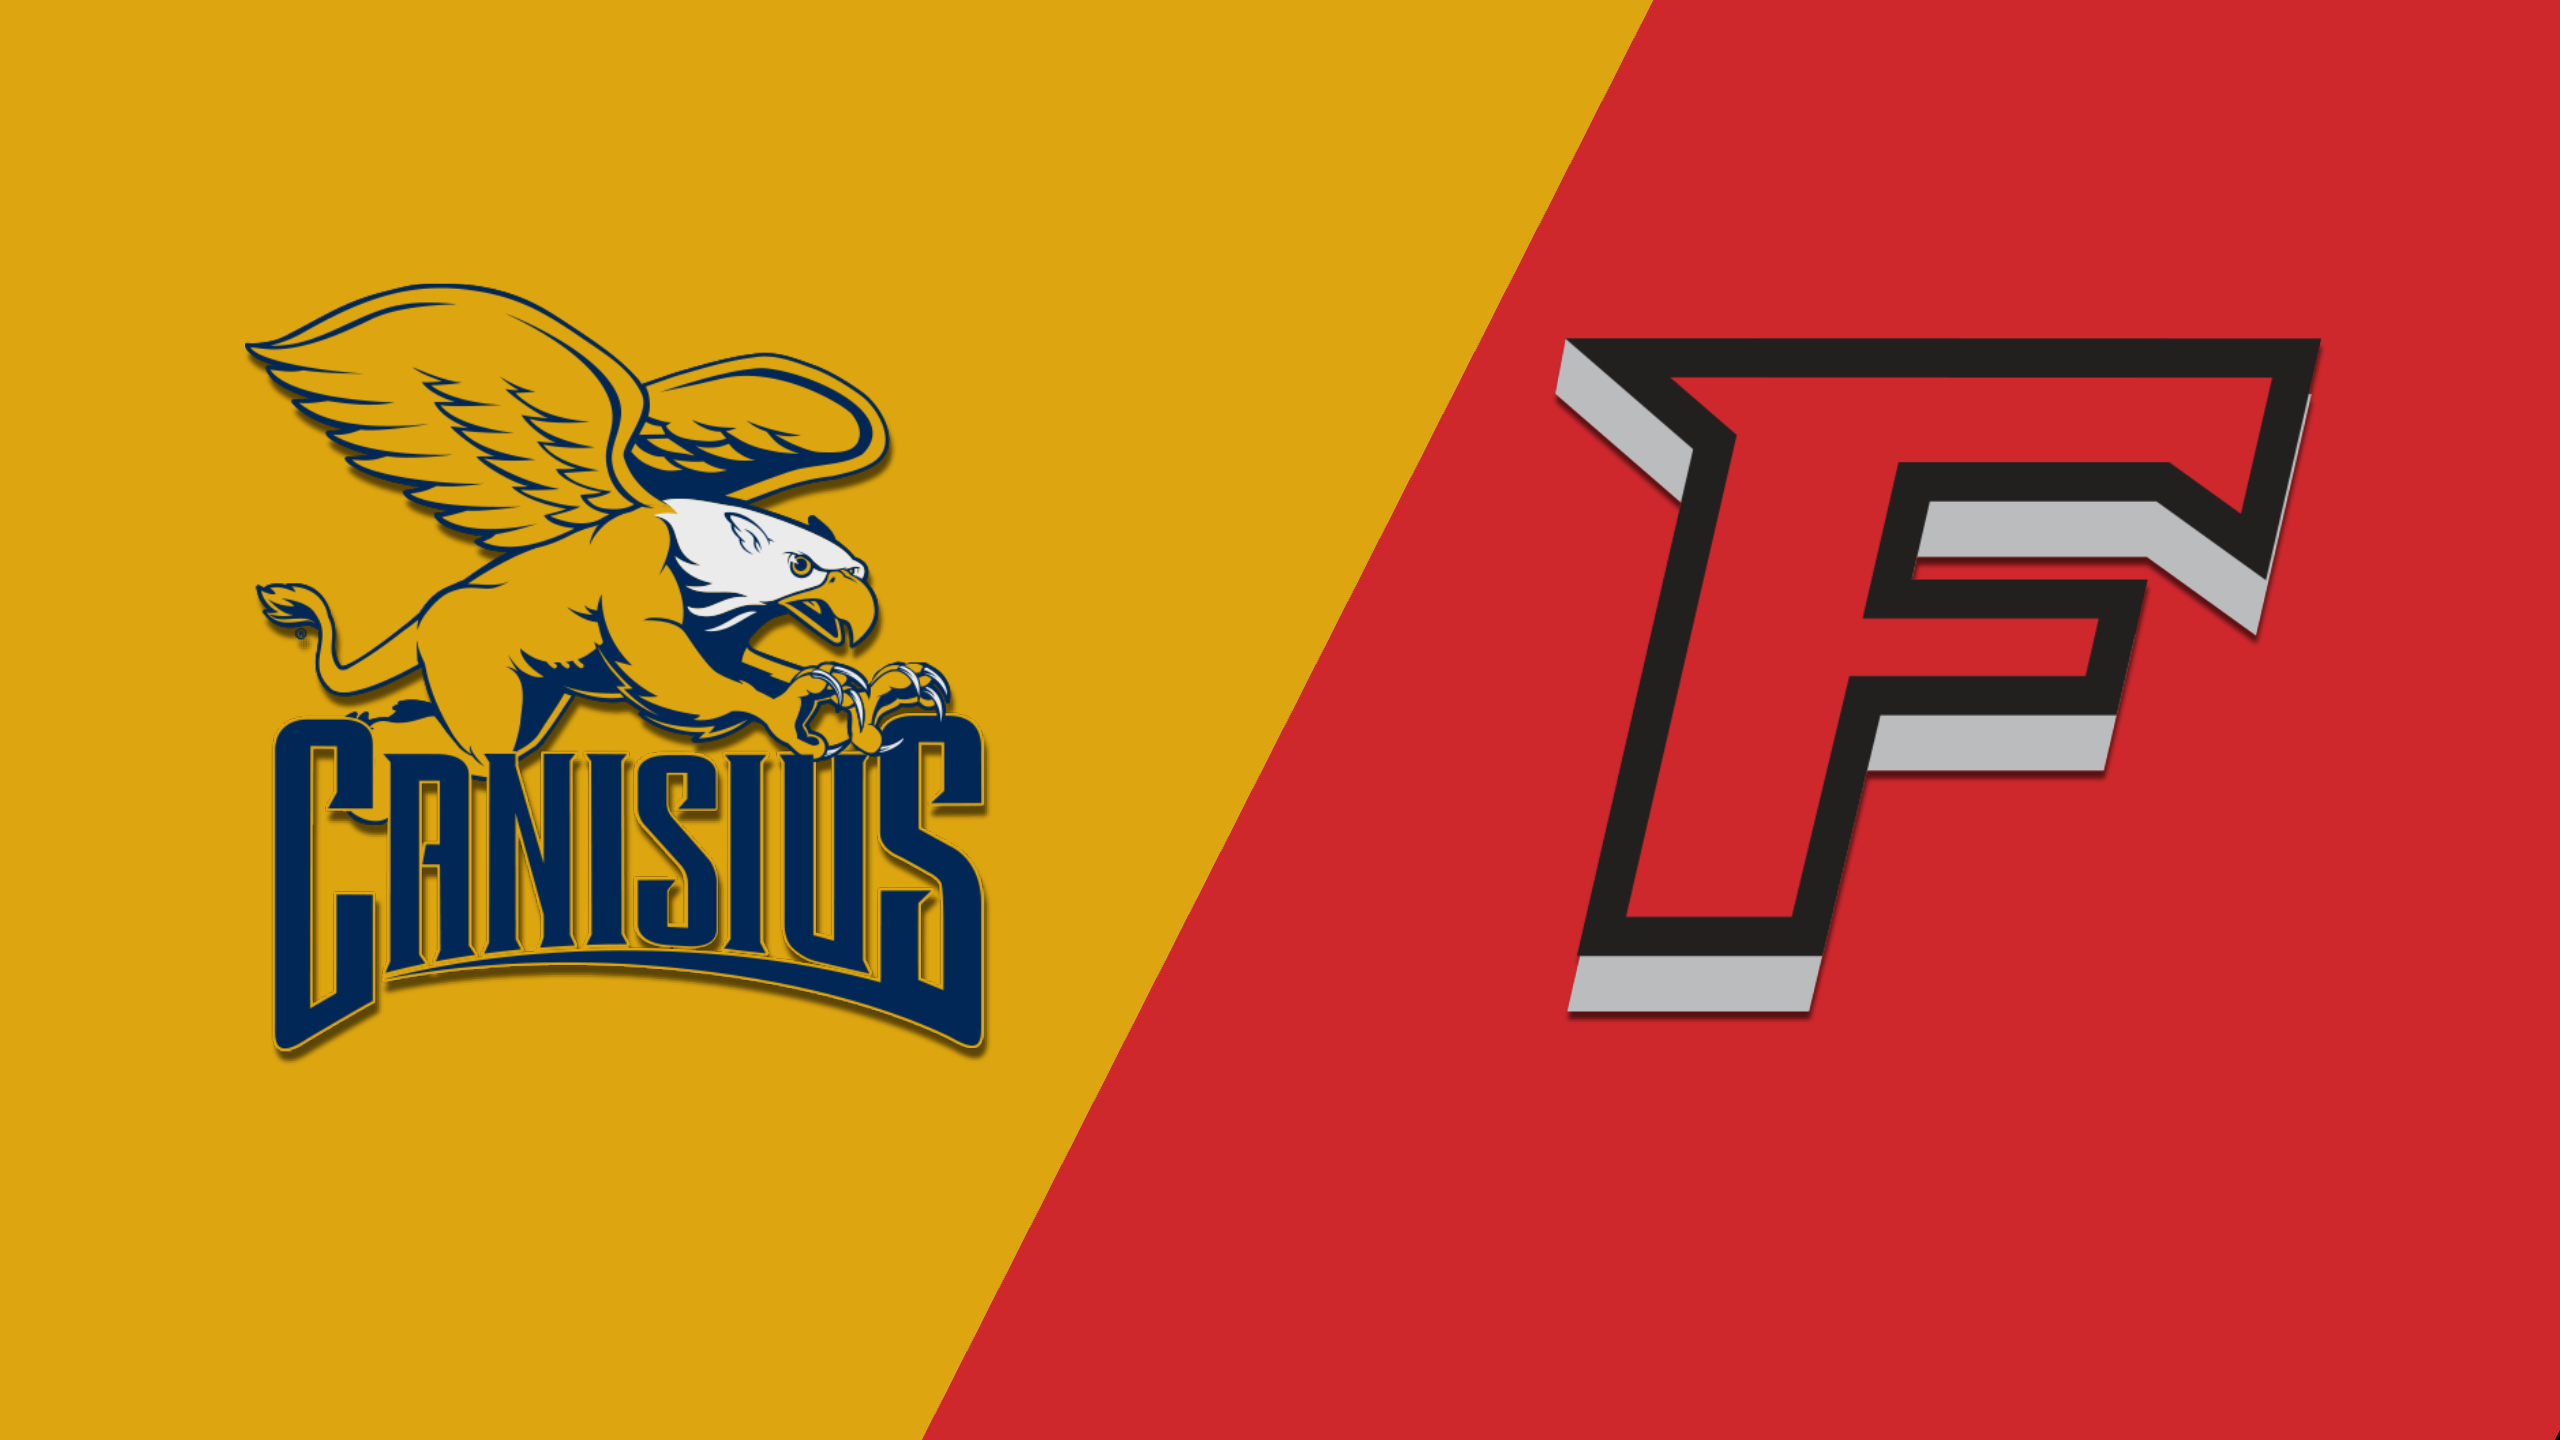 Canisius vs. Fairfield (M Basketball)